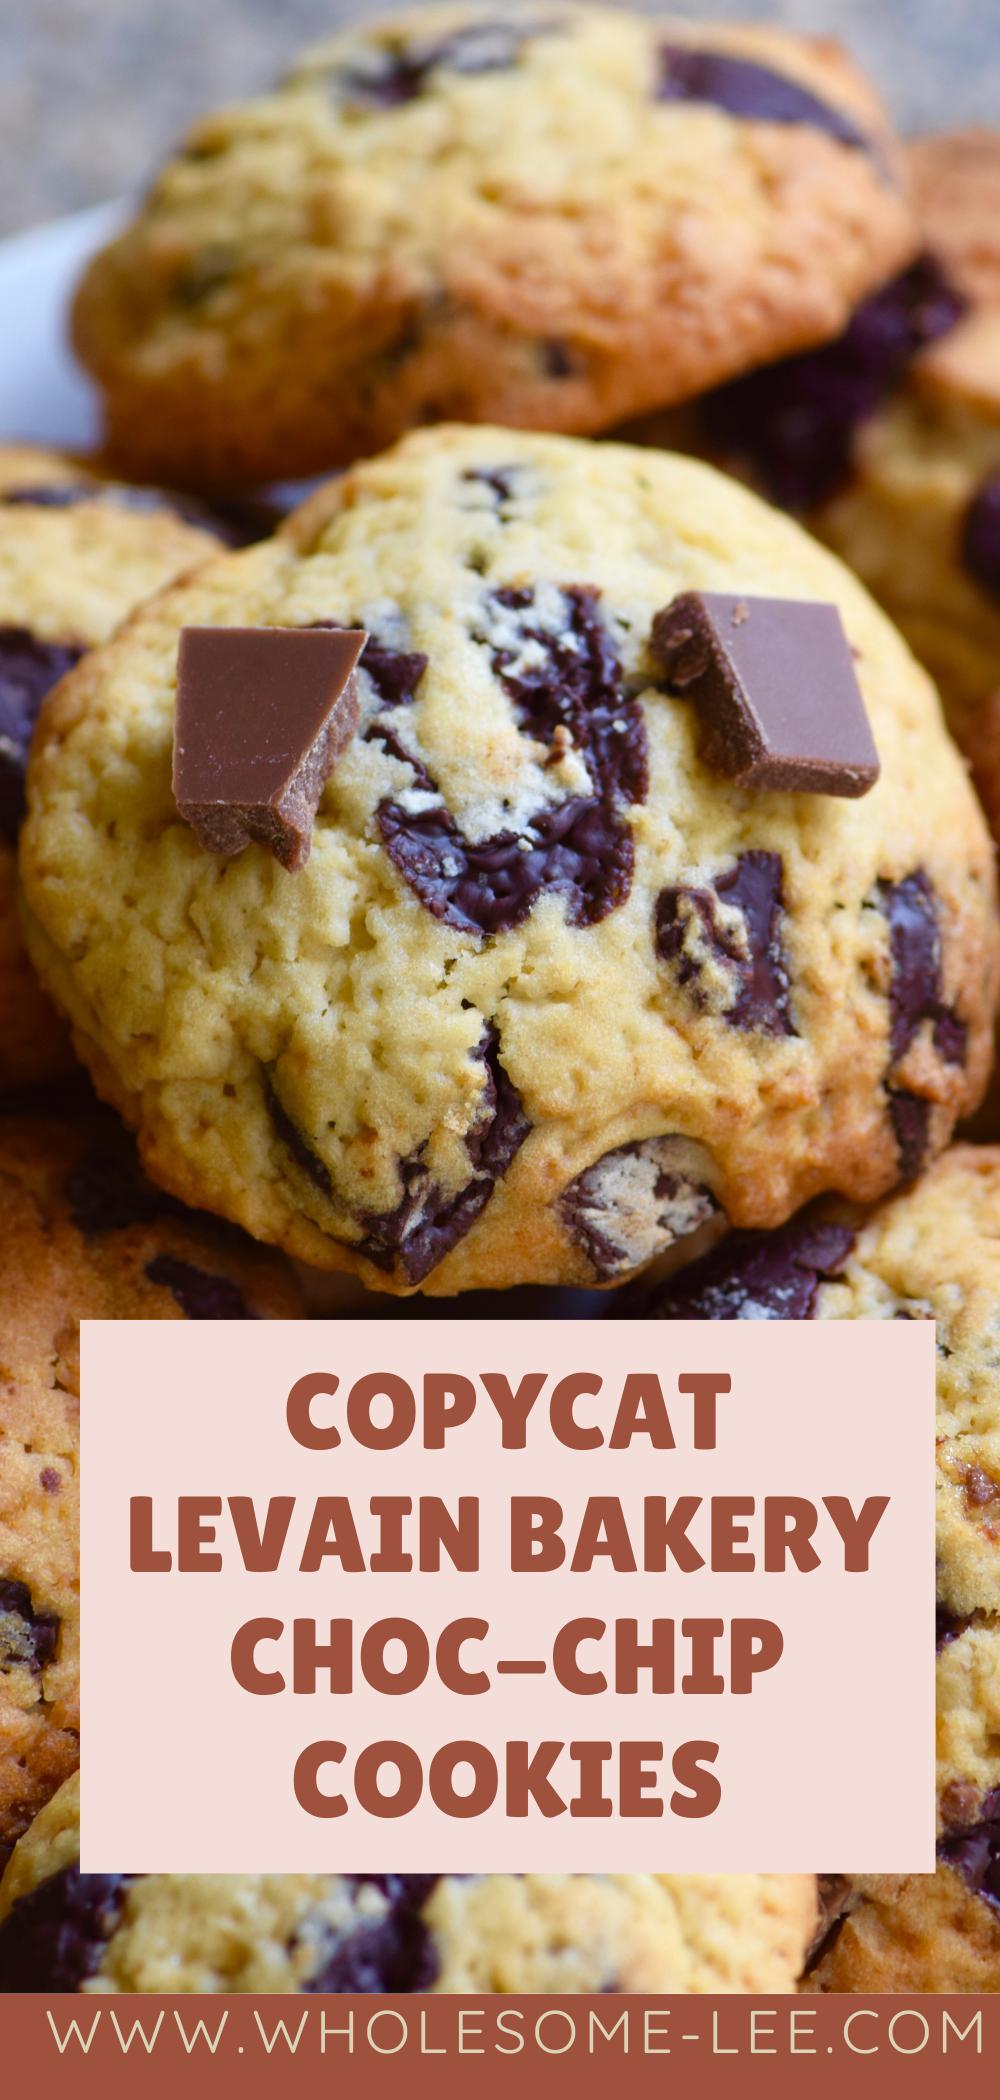 Copycat levian bakery choc-chip cookies